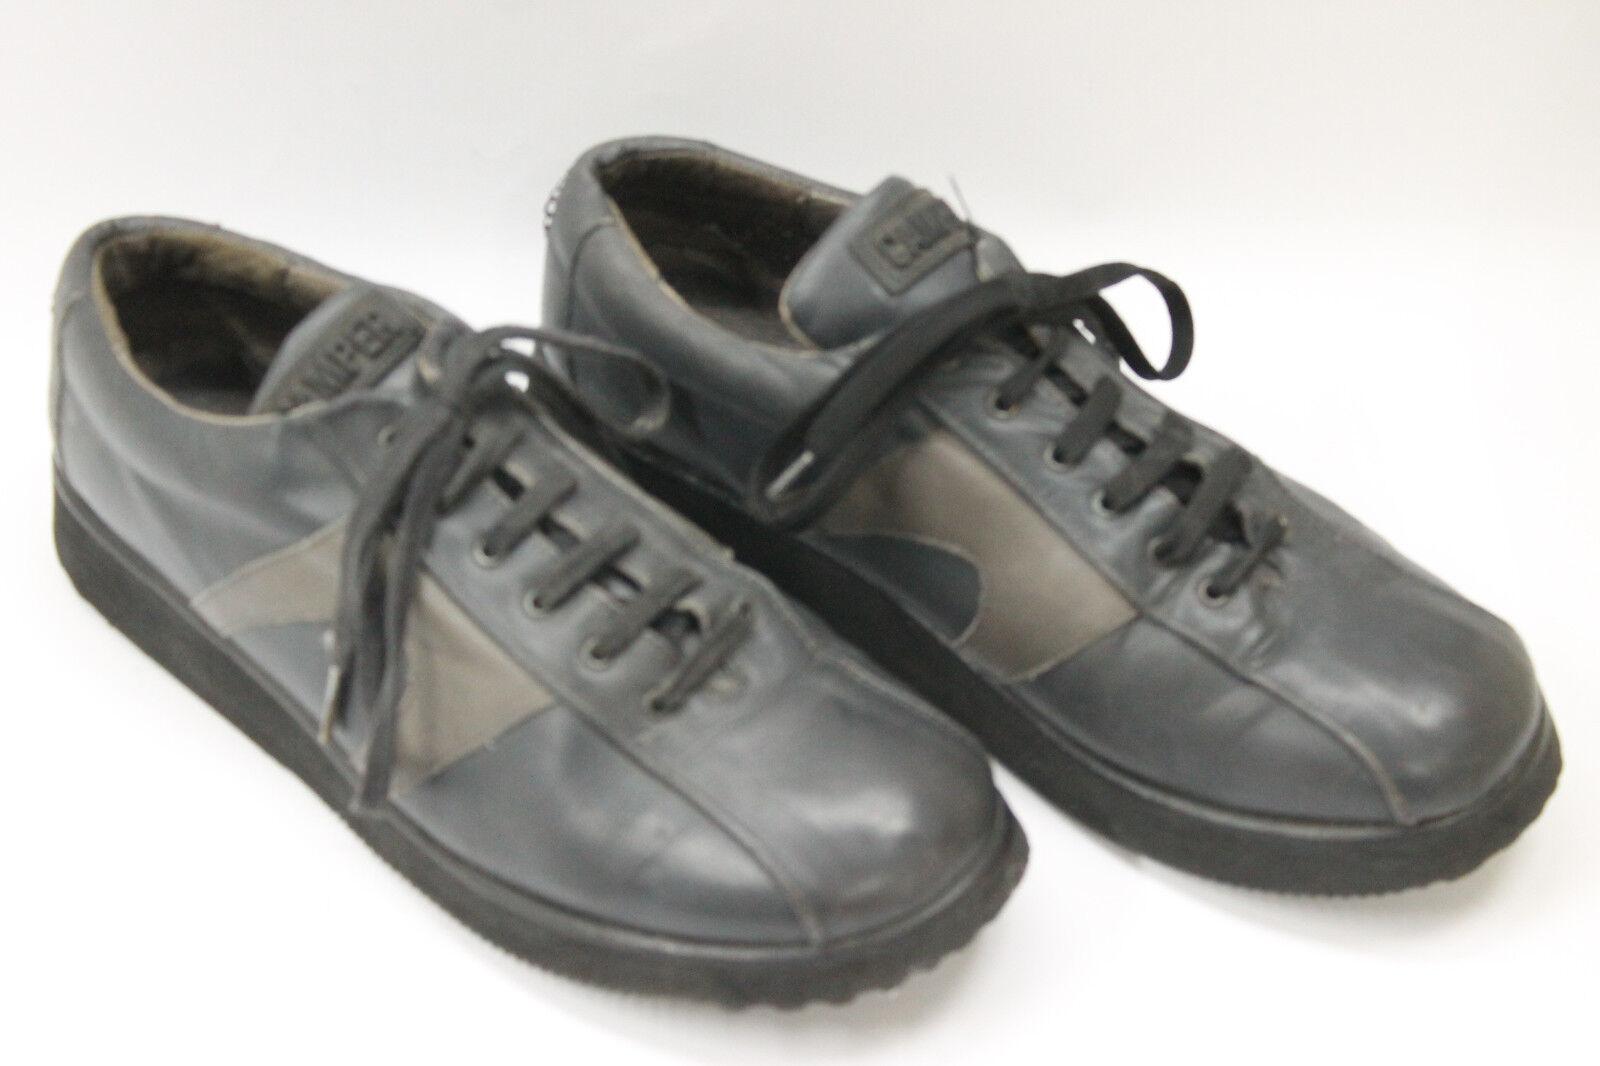 CAMPER men shoes sz 8 Europe 41 black leather S7268